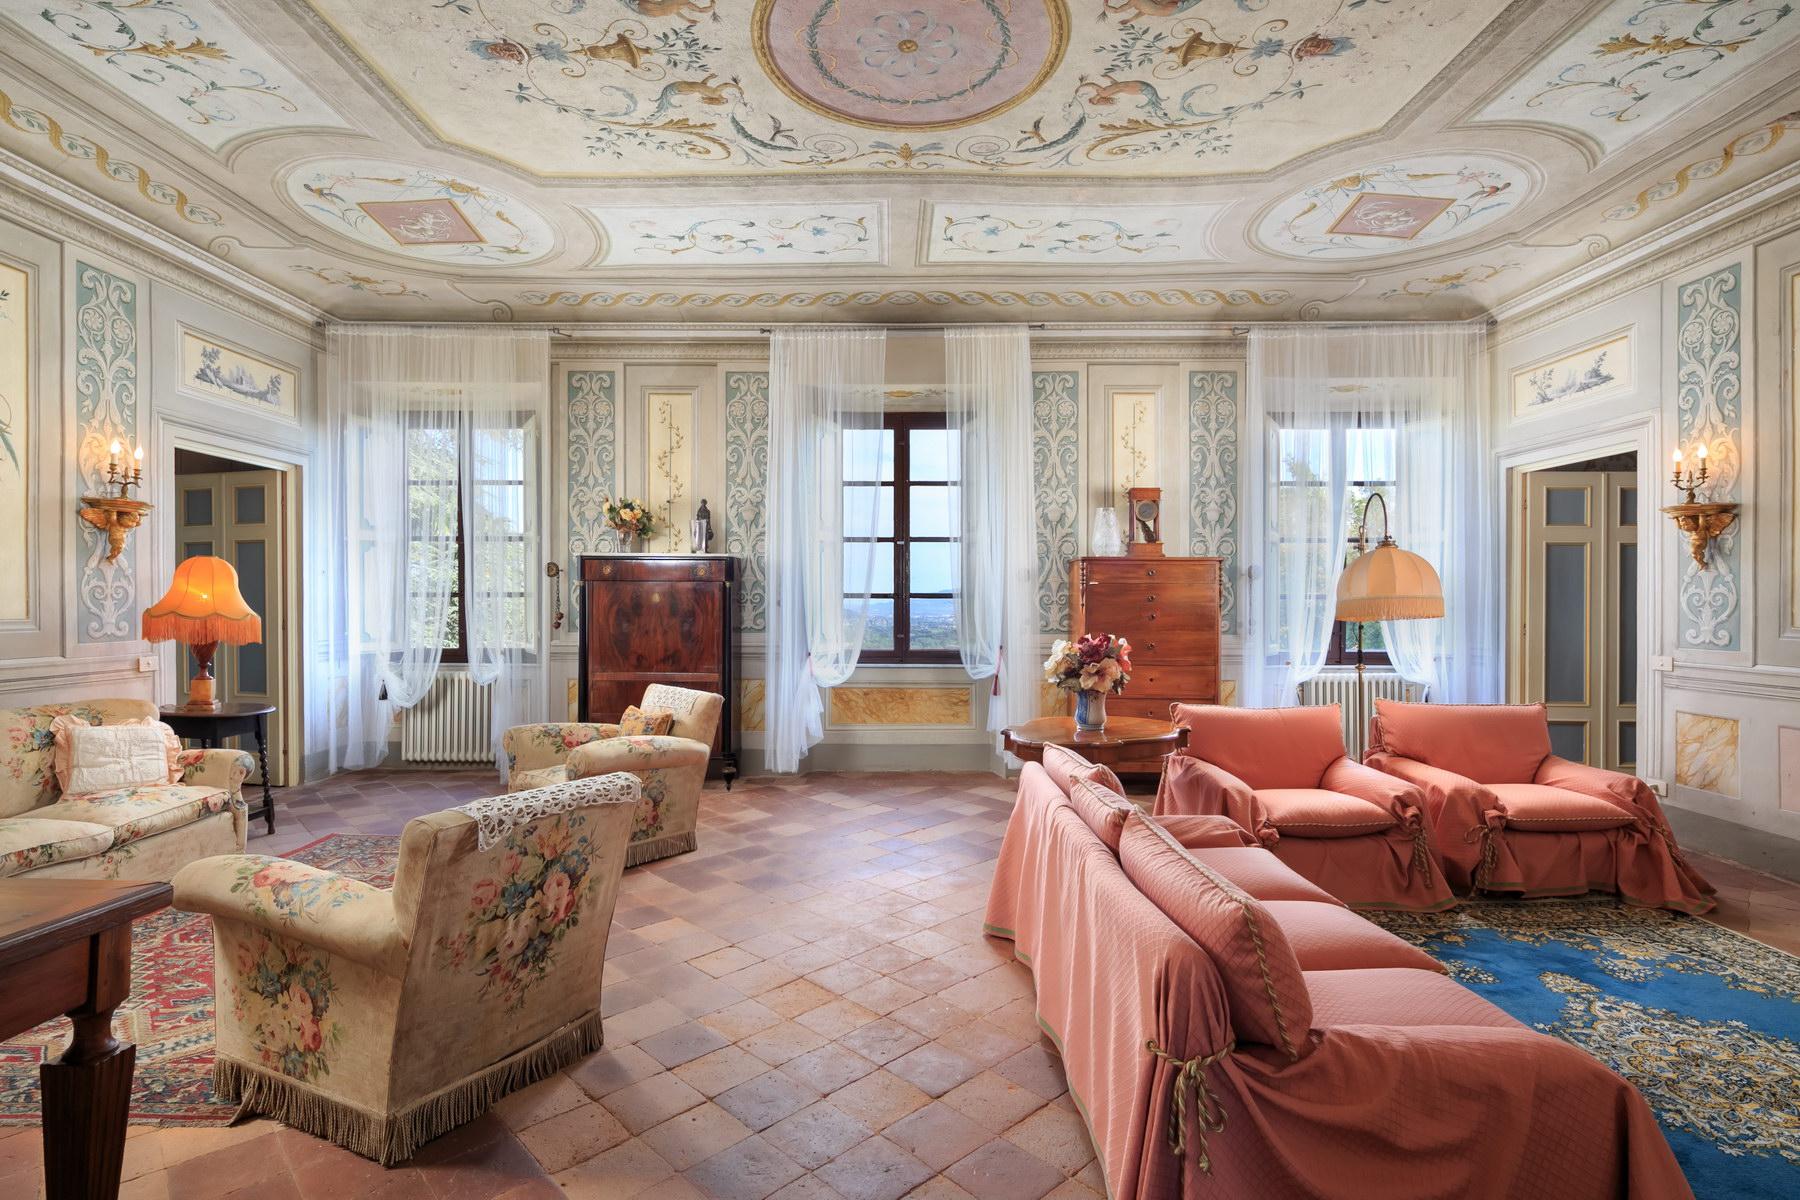 Villa in Vendita a Capannori: 5 locali, 570 mq - Foto 6